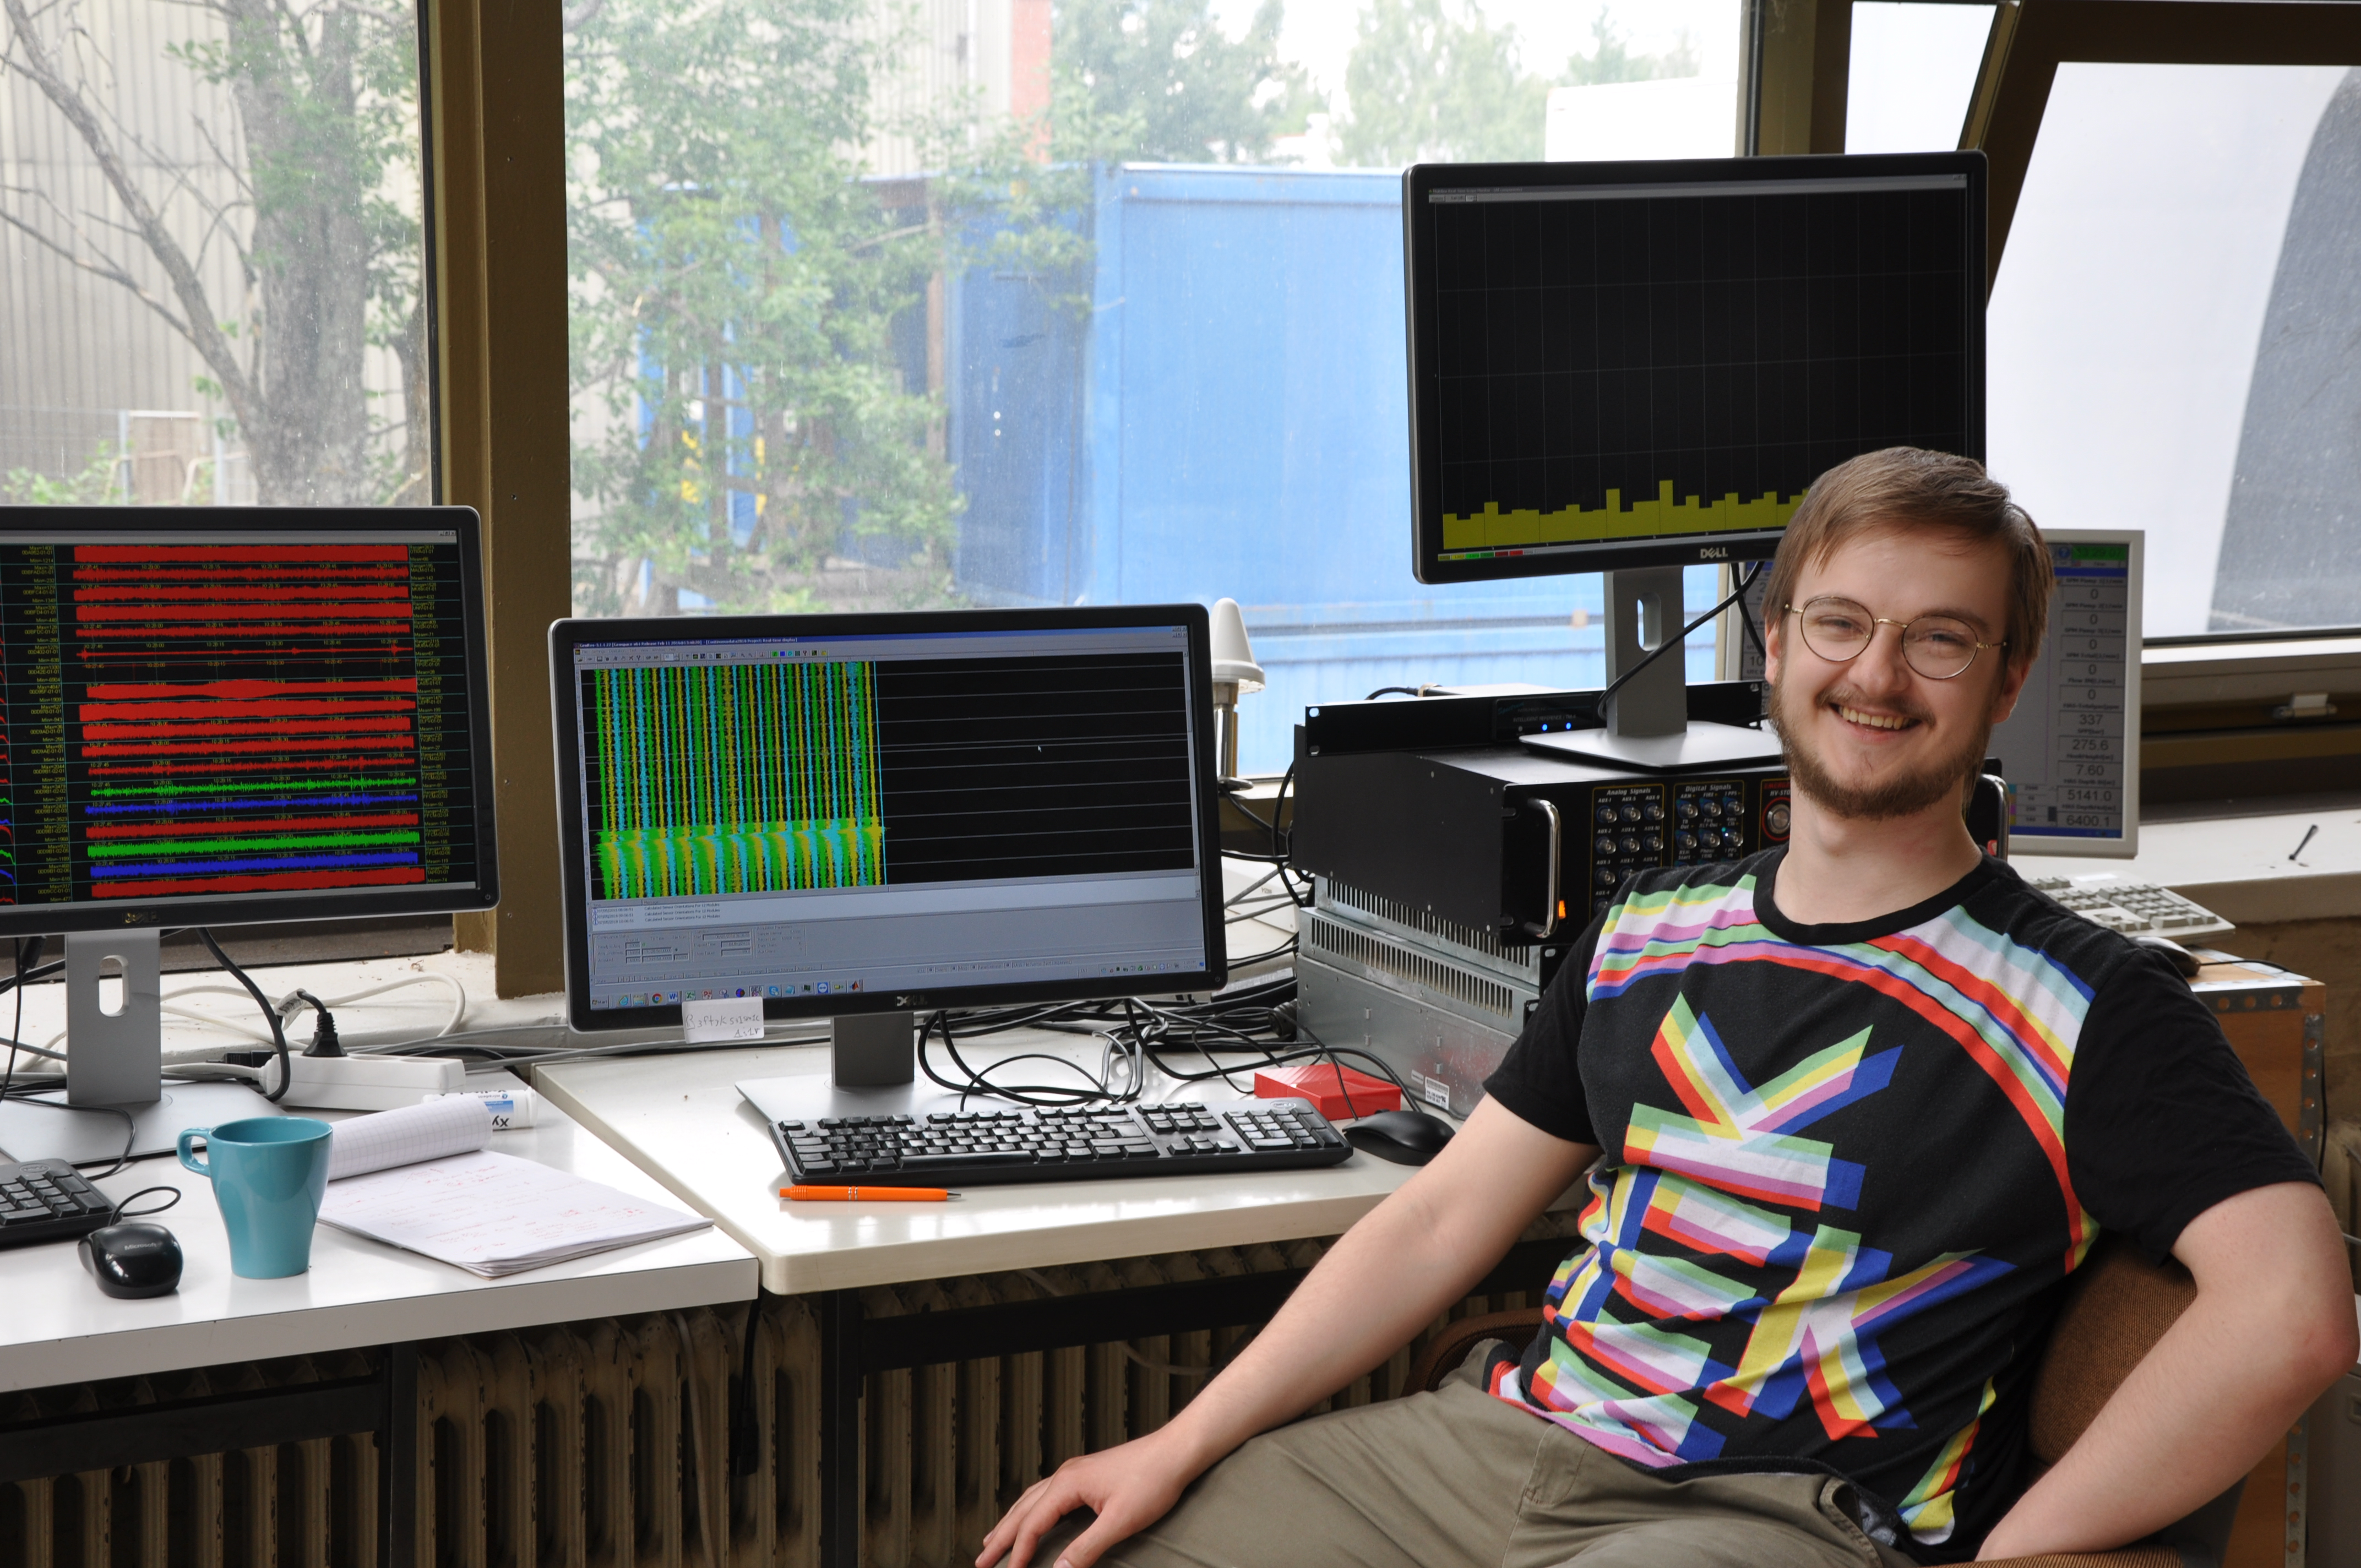 Kalle at Otaniemi control room